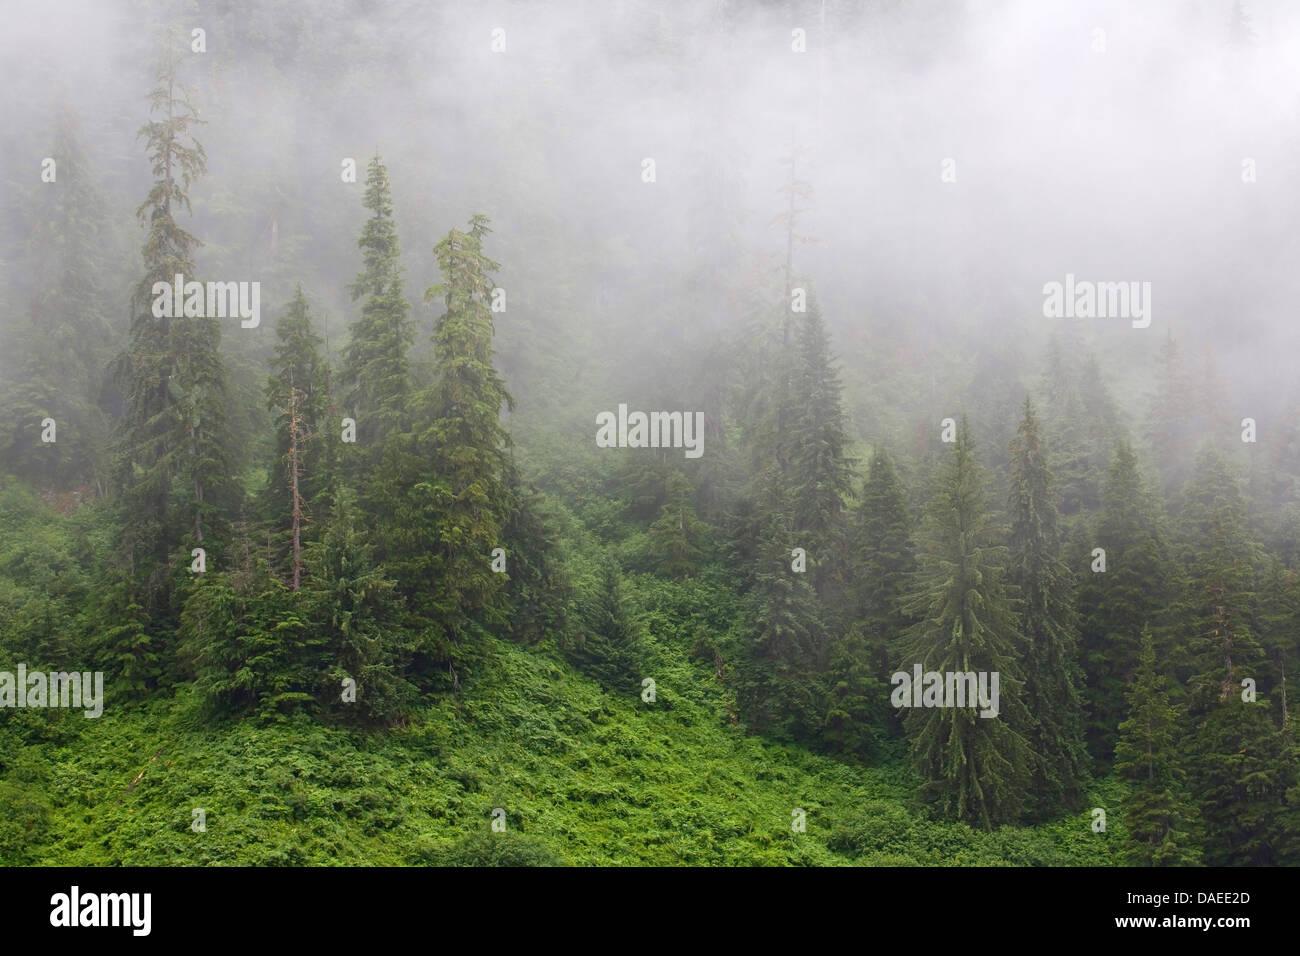 Mountain hemlock (Tsuga mertensiana), Waft of mist in mountain forest, USA, Alaska, Misty Fjords National Monument - Stock Image